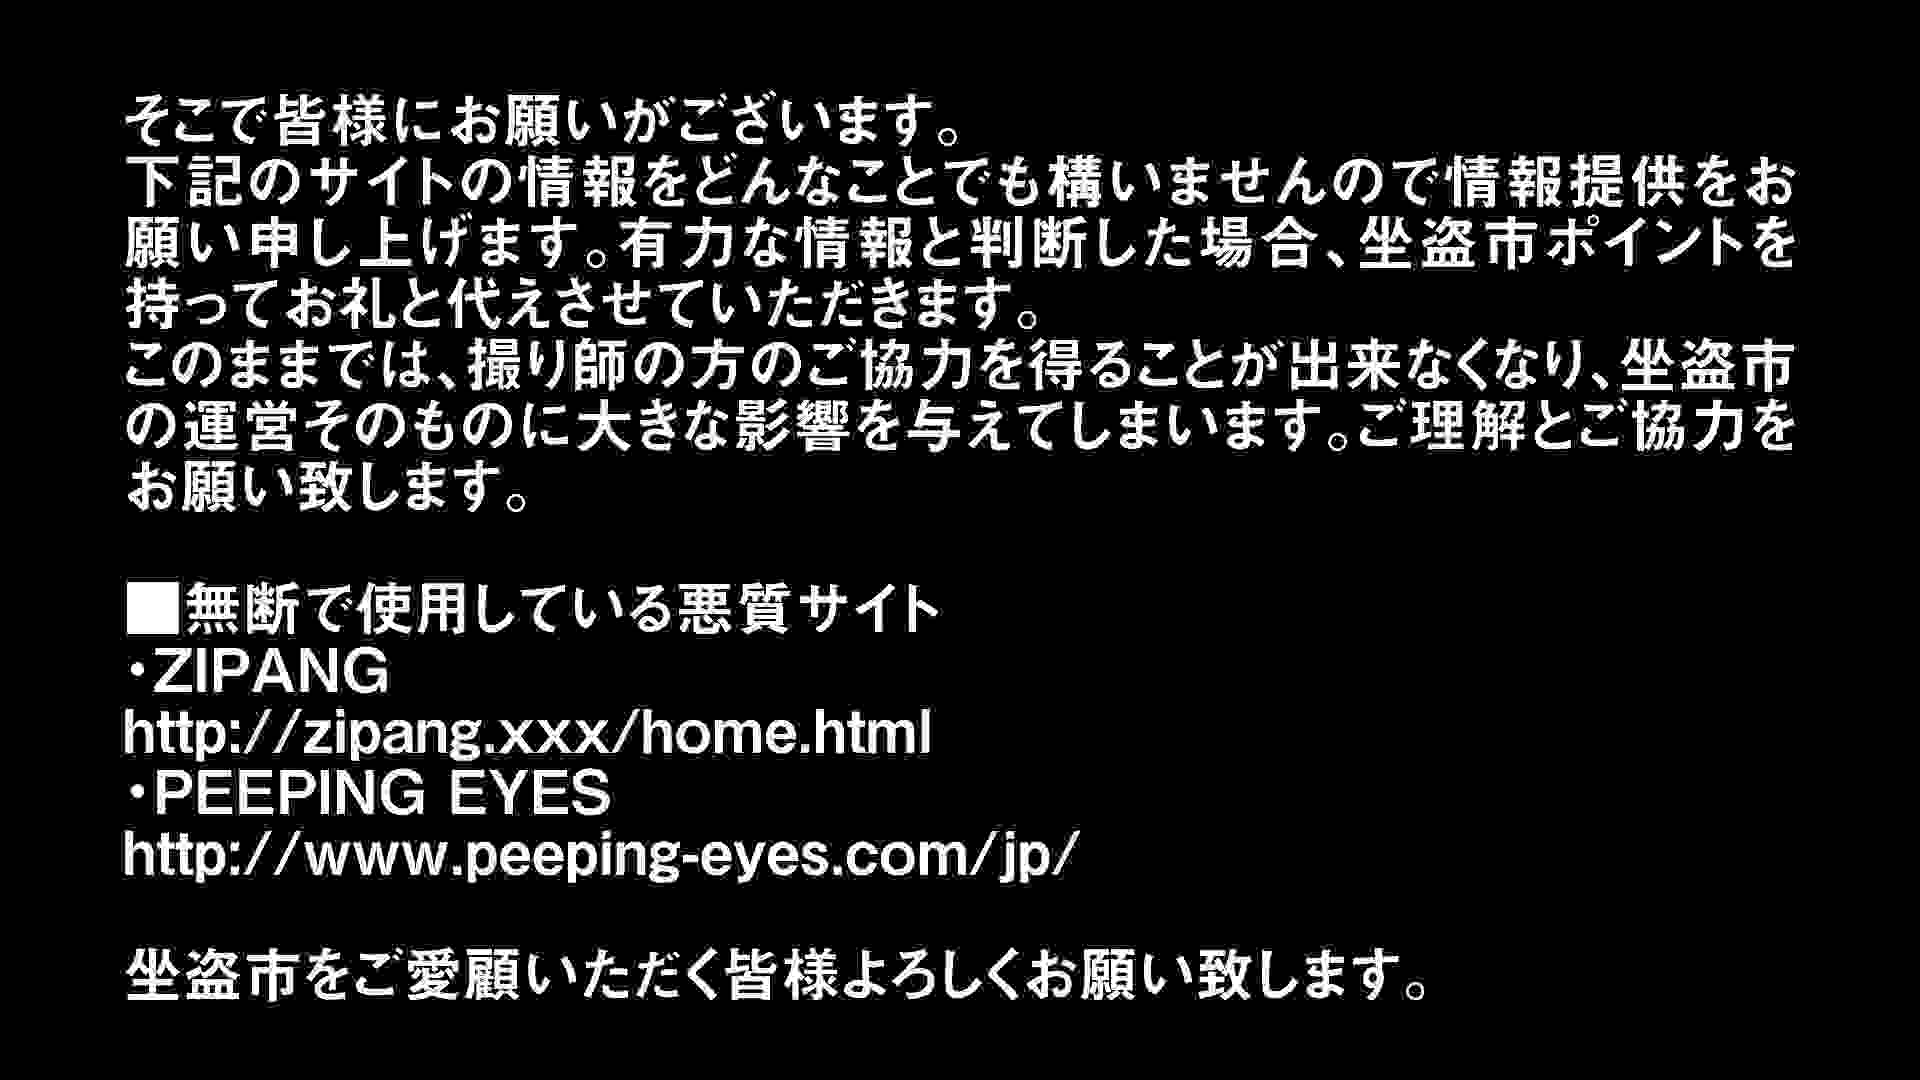 Aquaな露天風呂Vol.299 盗撮シリーズ | 露天風呂編  82PIX 31